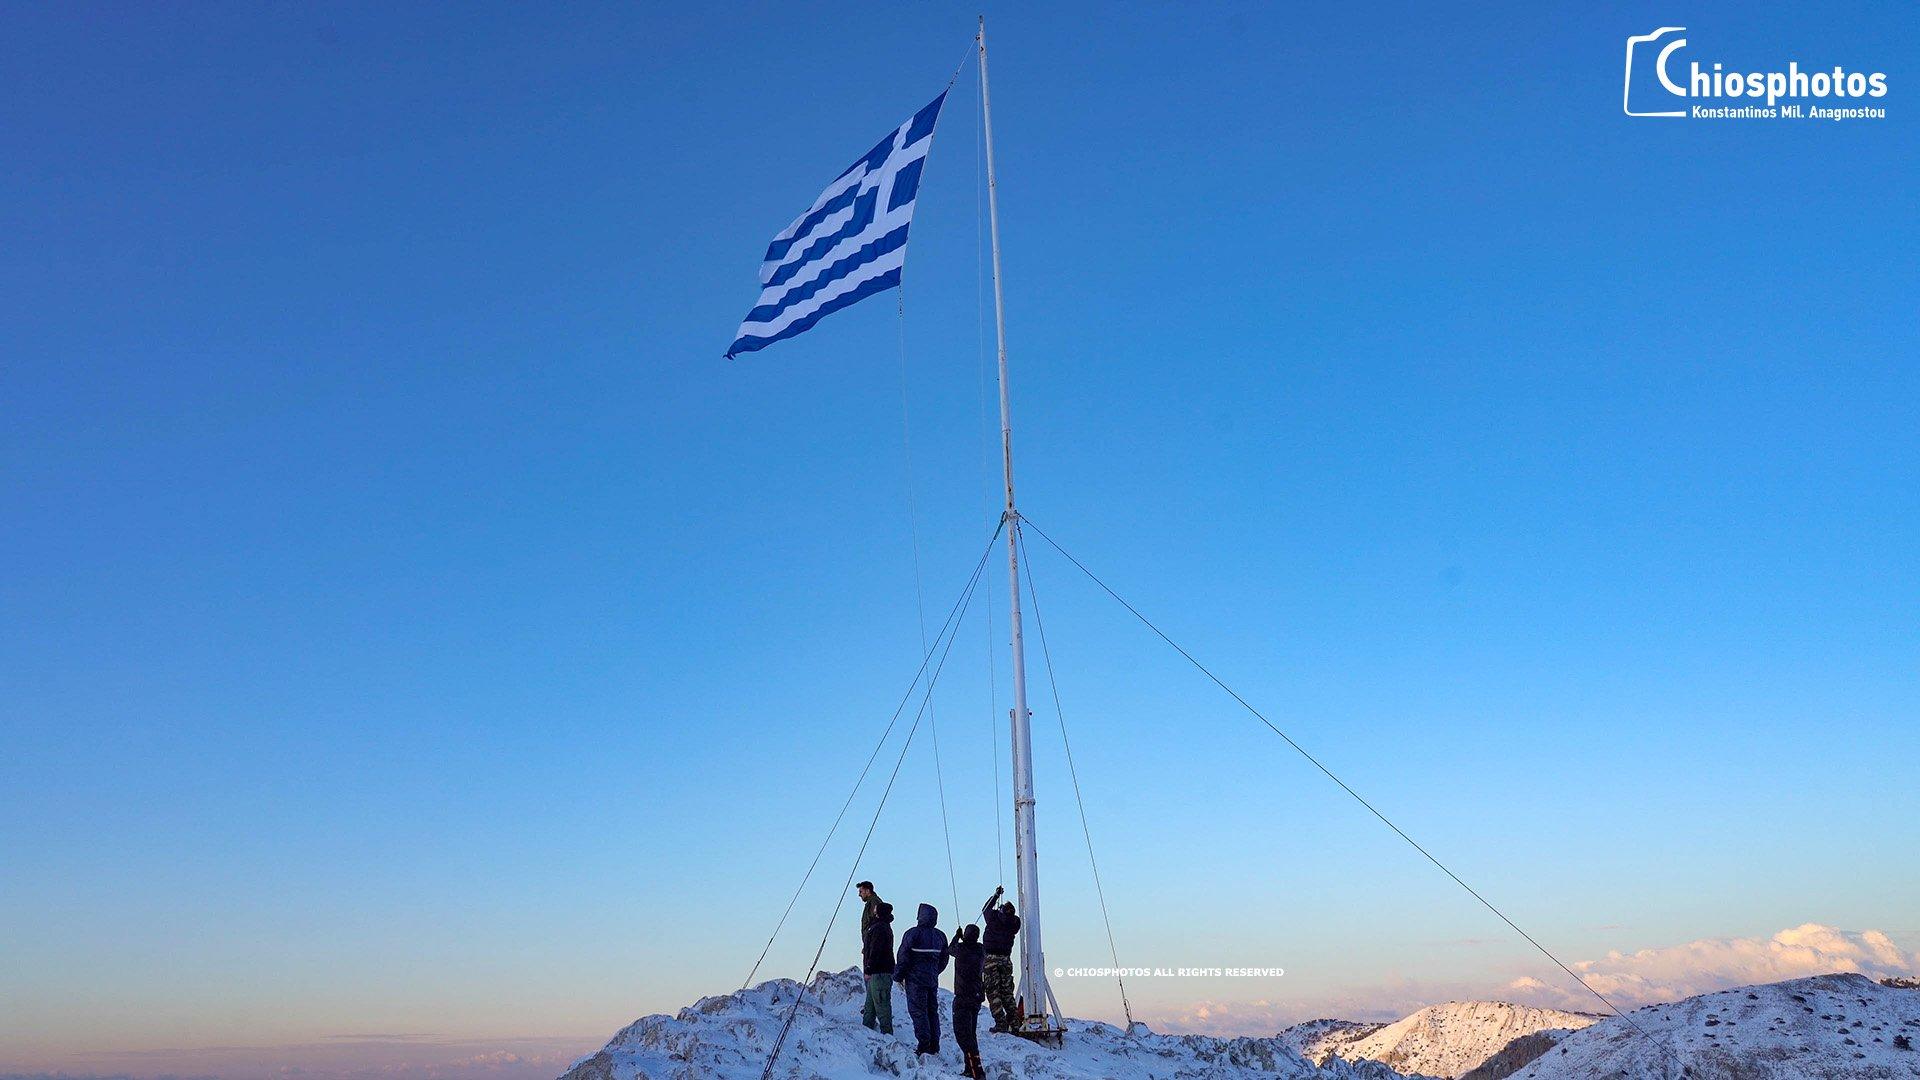 You are currently viewing Οι Χιώτες ύψωσαν μία μεγάλη Ελληνική Σημαία στην κορυφή του Πηγάνιου Όρους